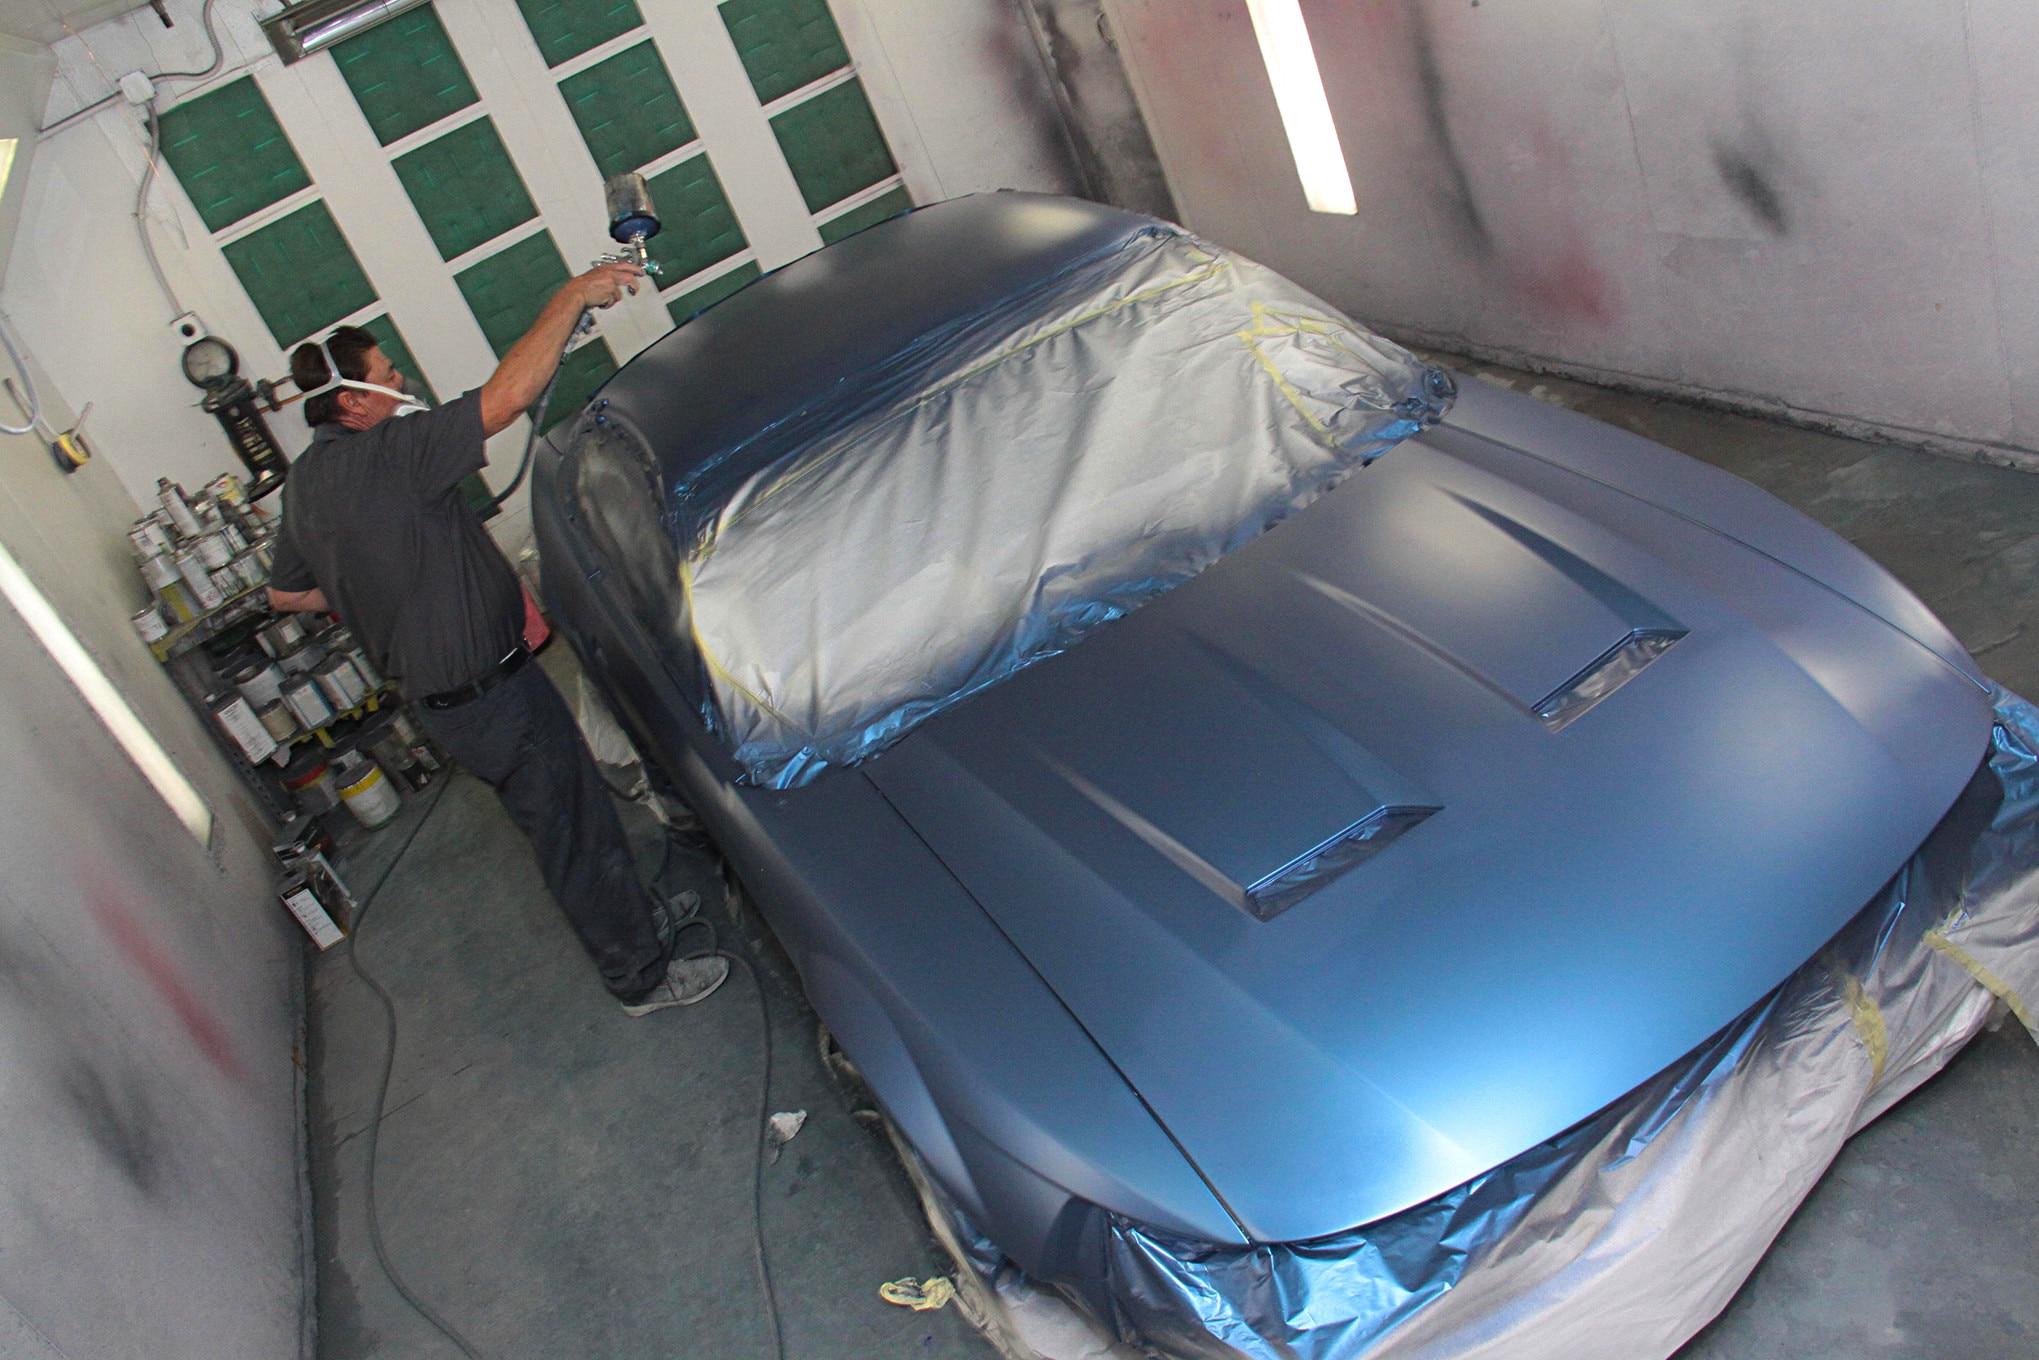 011 1999 Mustang Gt Paint Preparation Axalta Fitment